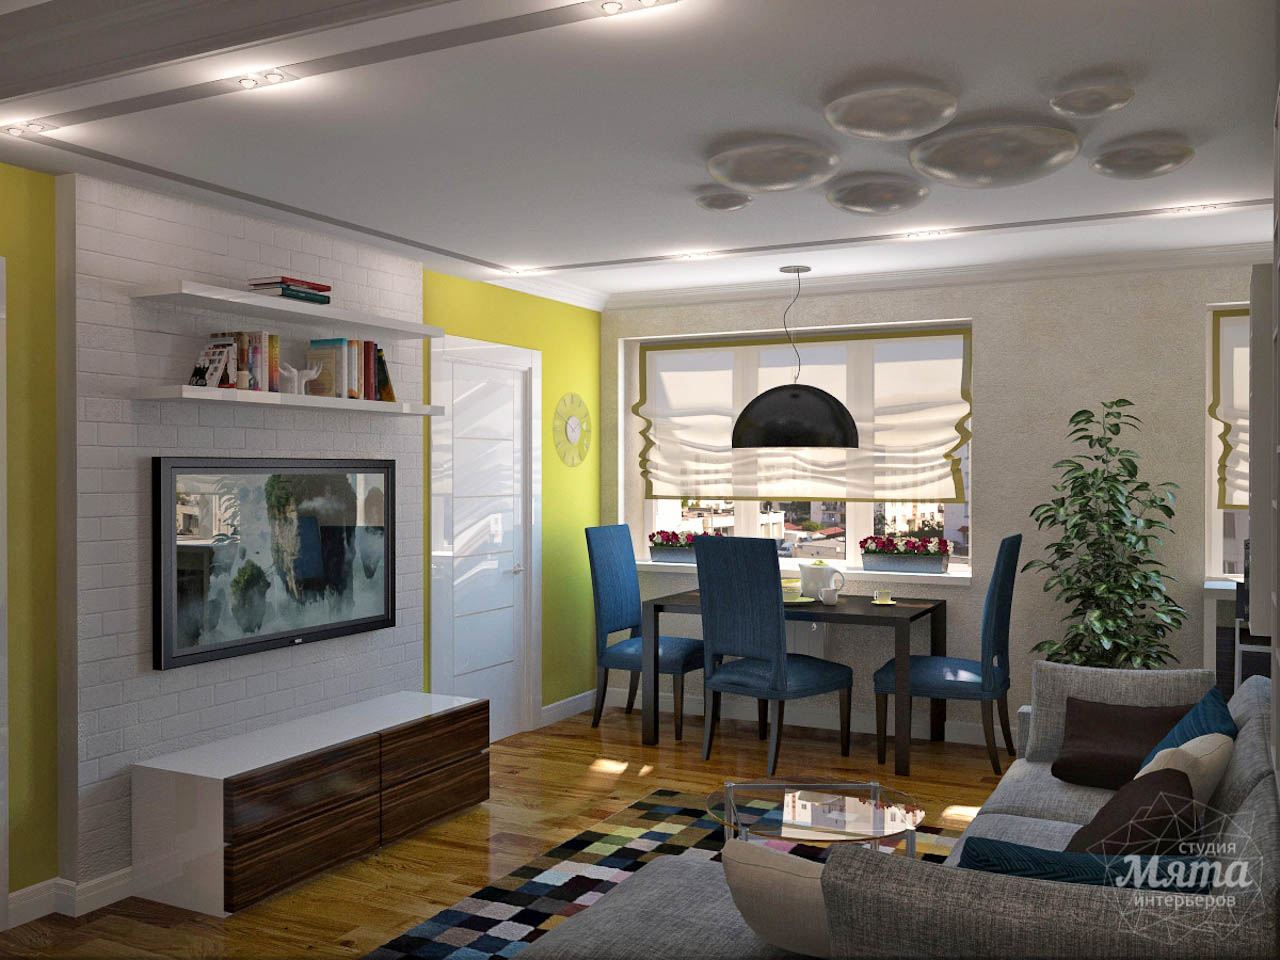 Дизайн интерьера двухкомнатной квартиры по ул. Комсомольская 14 img864830114